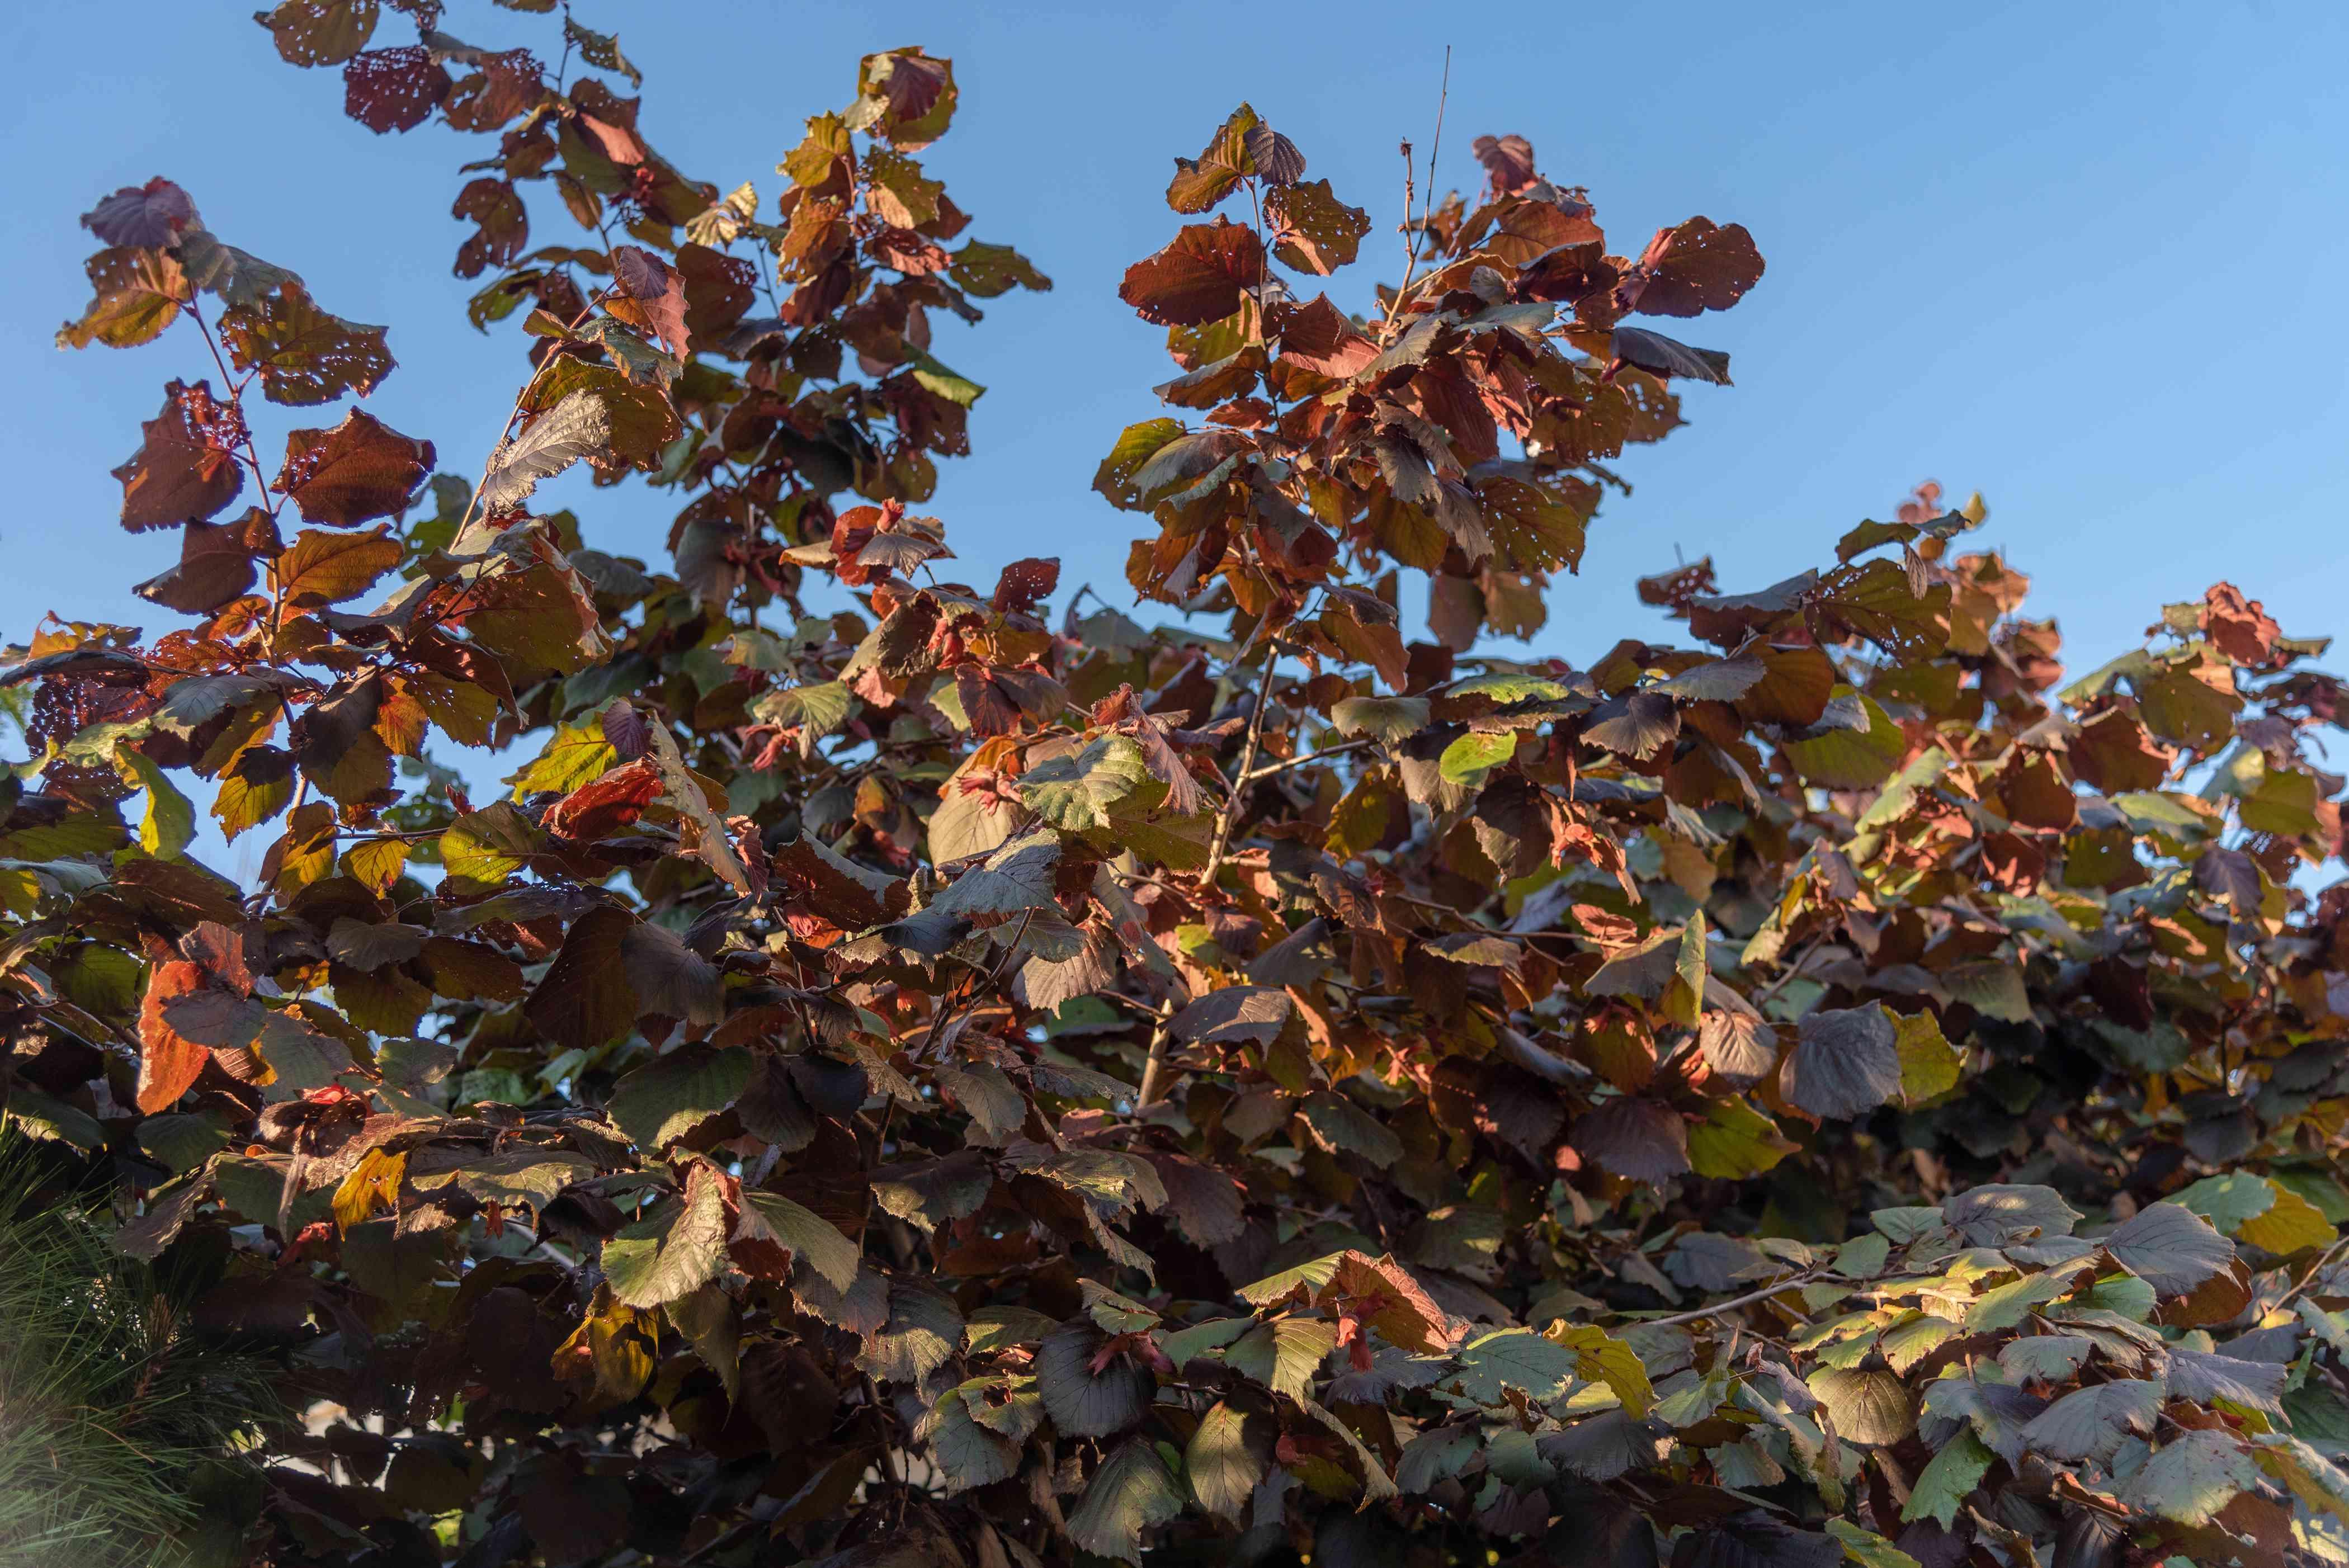 Beaked hazelnut shrub branches with reddish-green leaves against blue sky